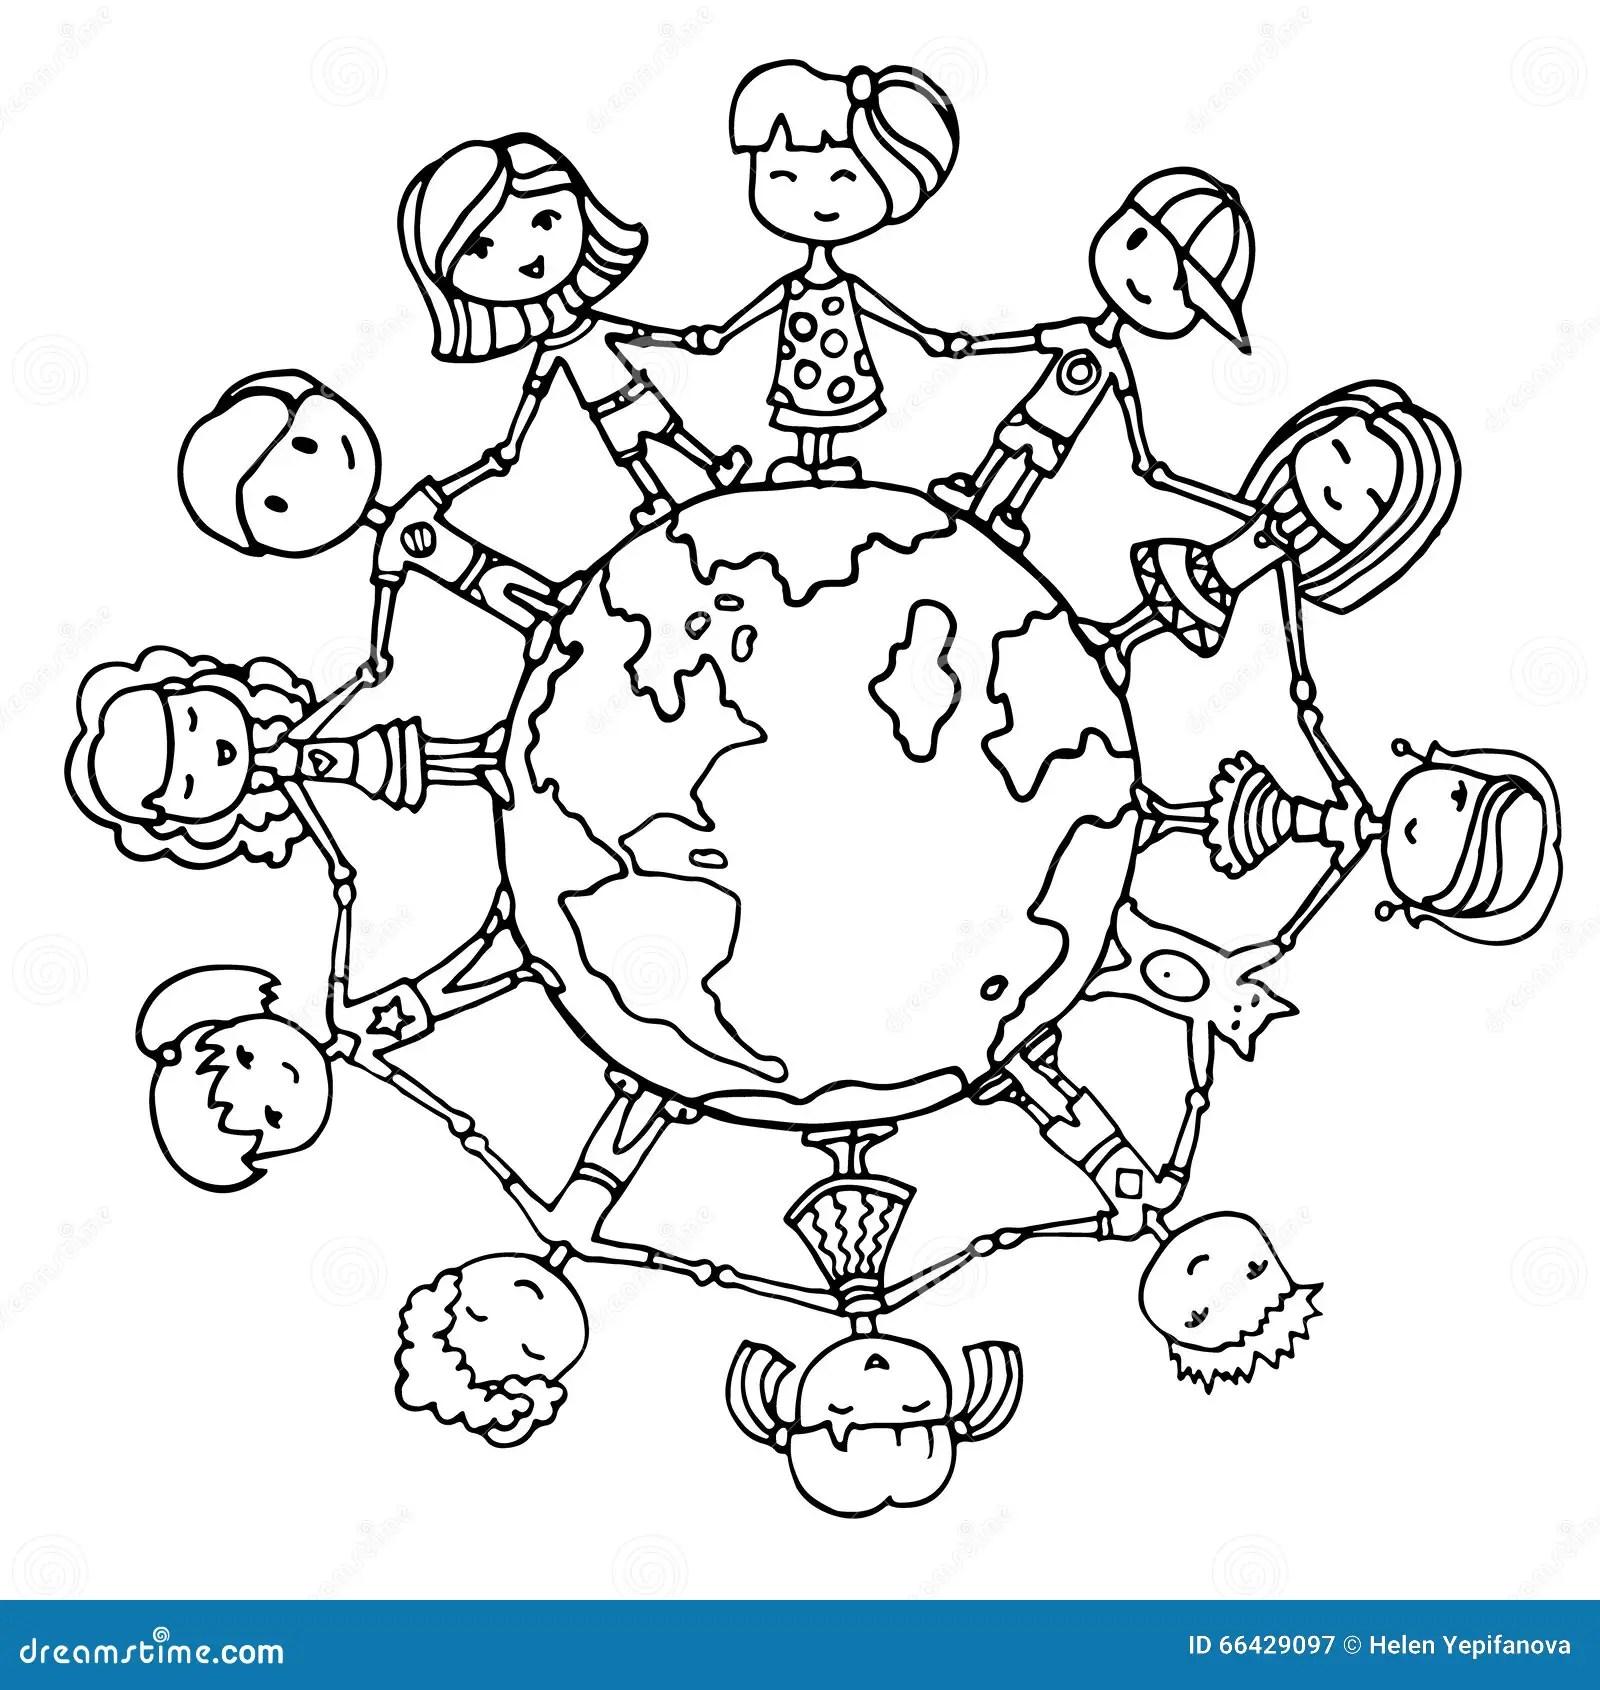 Children around the world stock vector. Illustration of